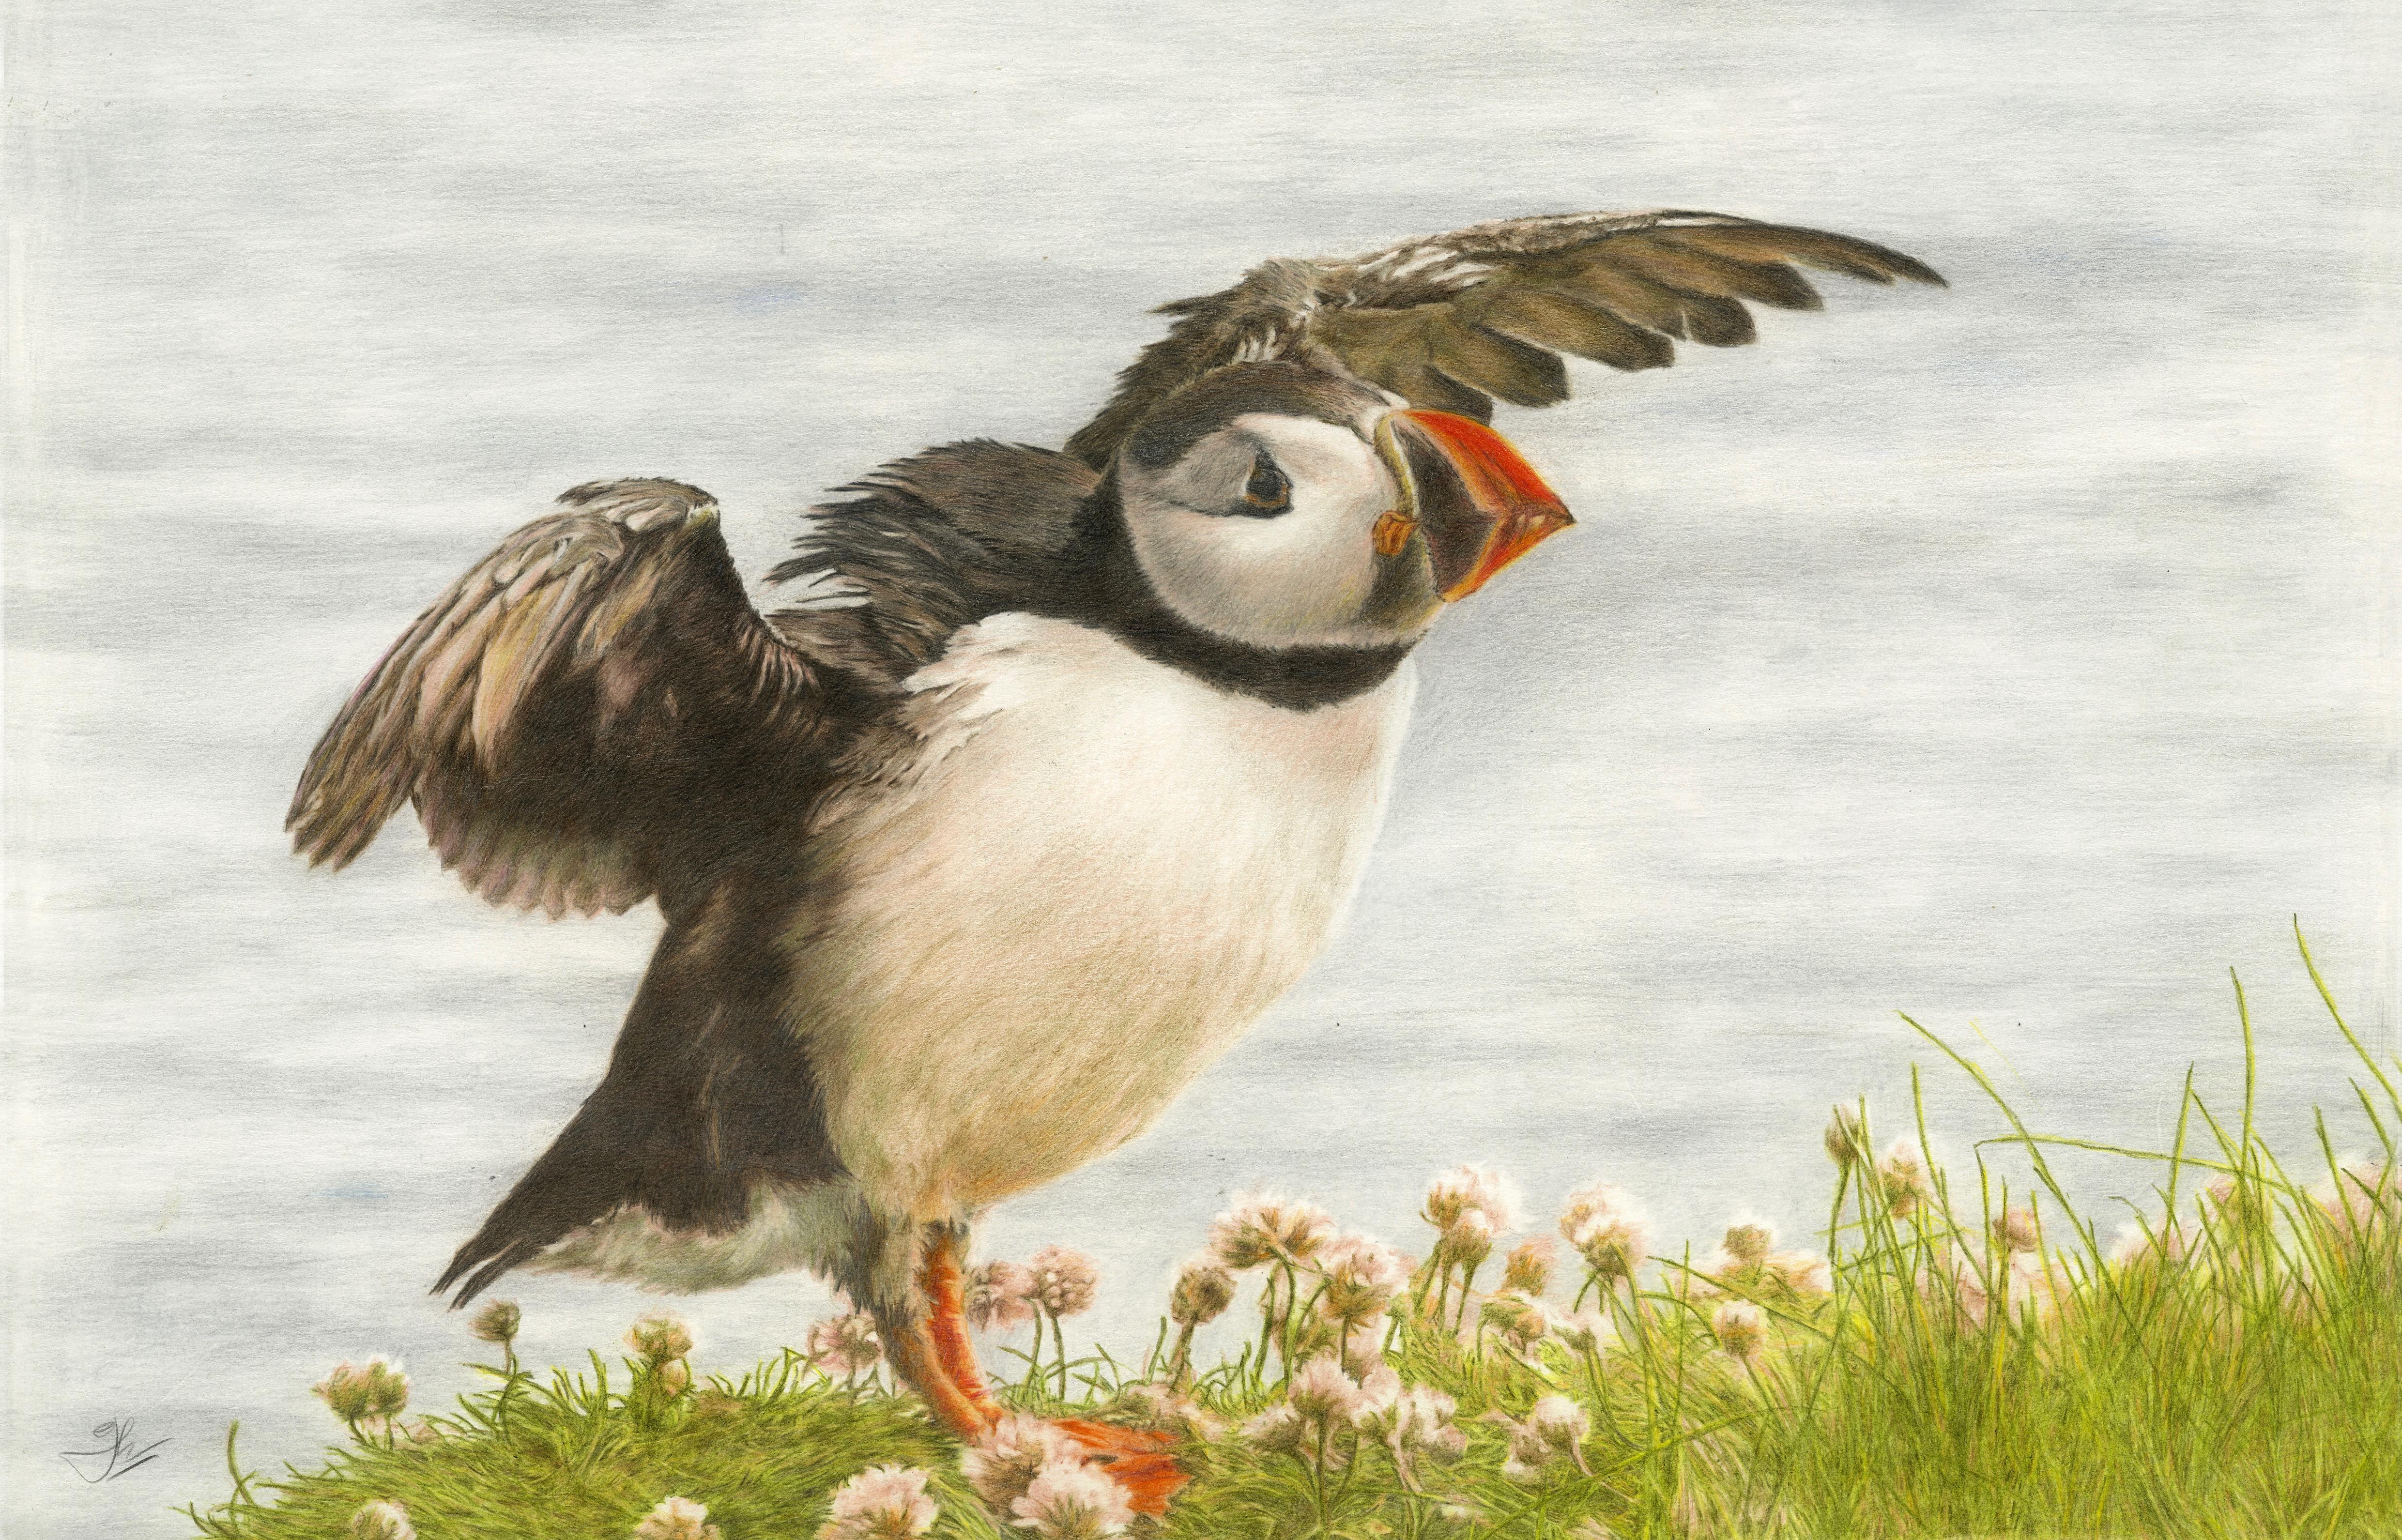 Puffin Taking Flight: